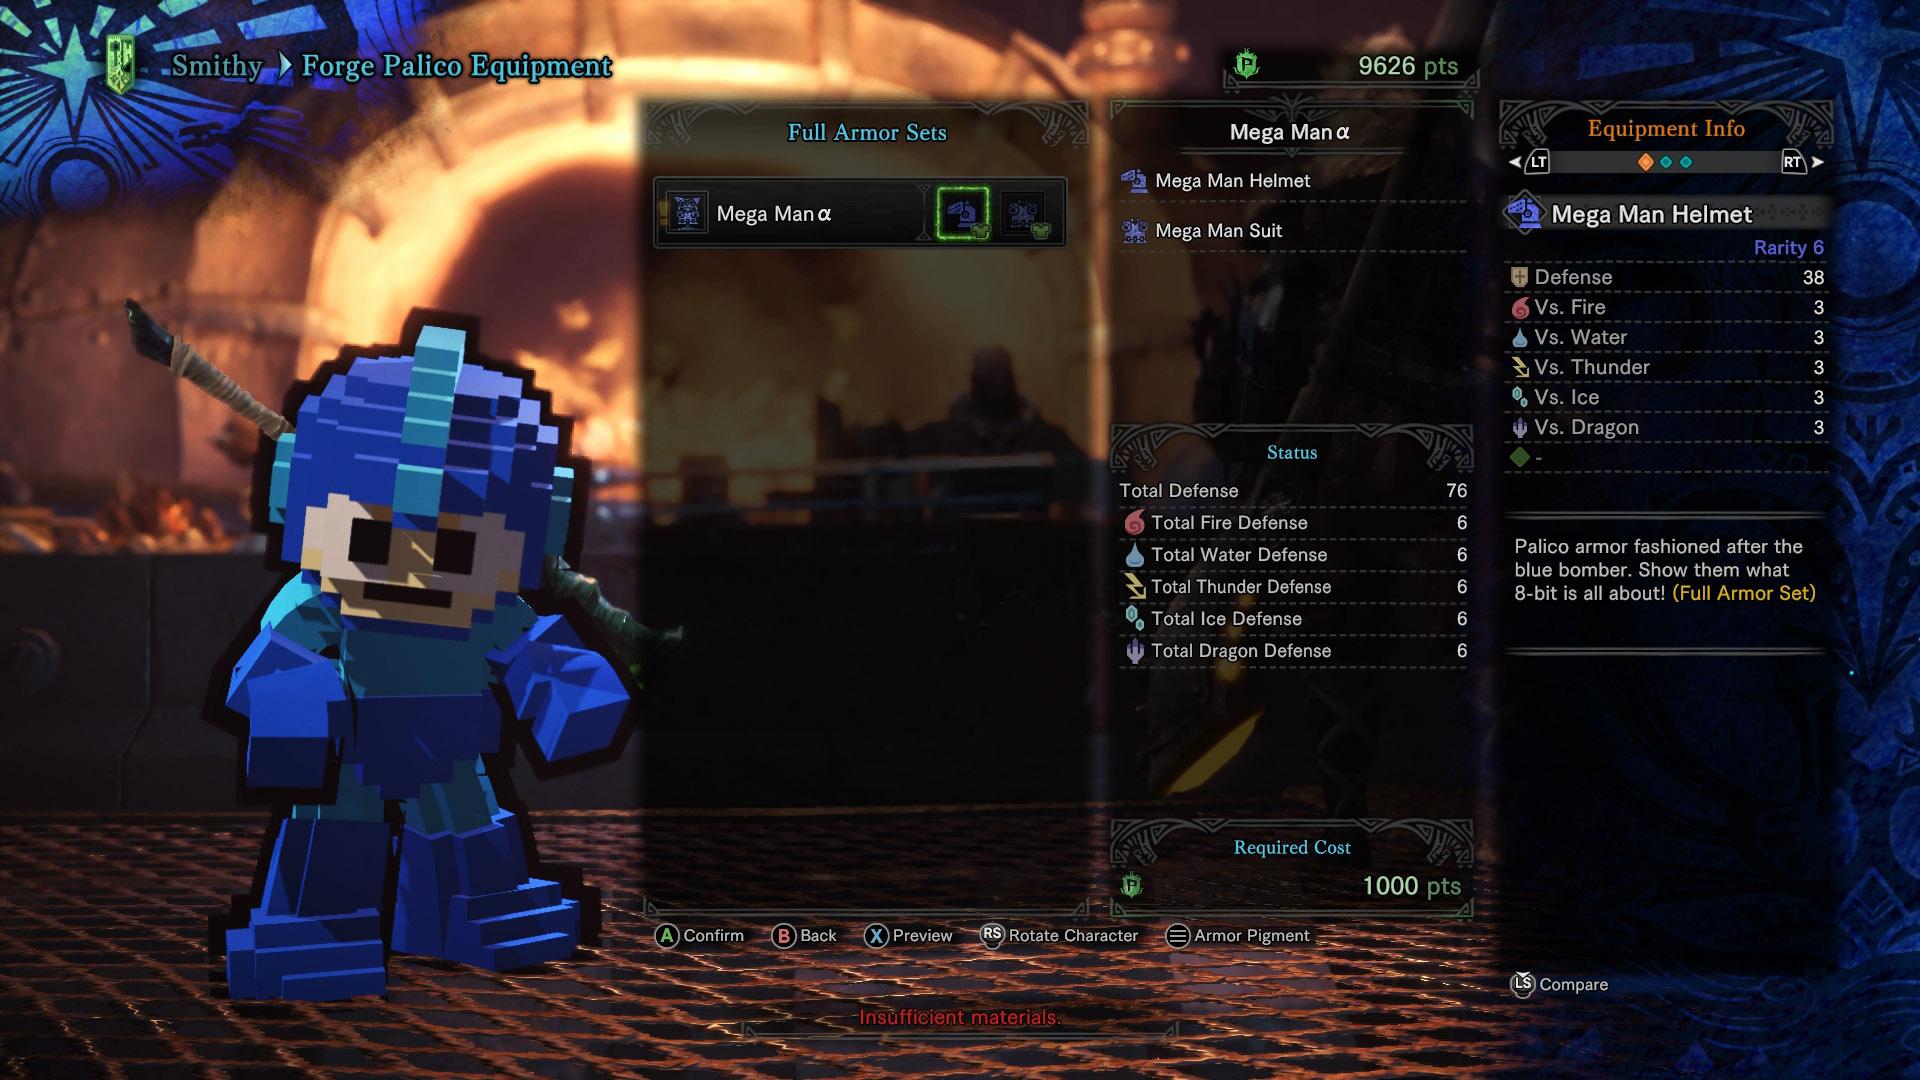 How To Unlock Mega Man Armor In Monster Hunter World Shacknews